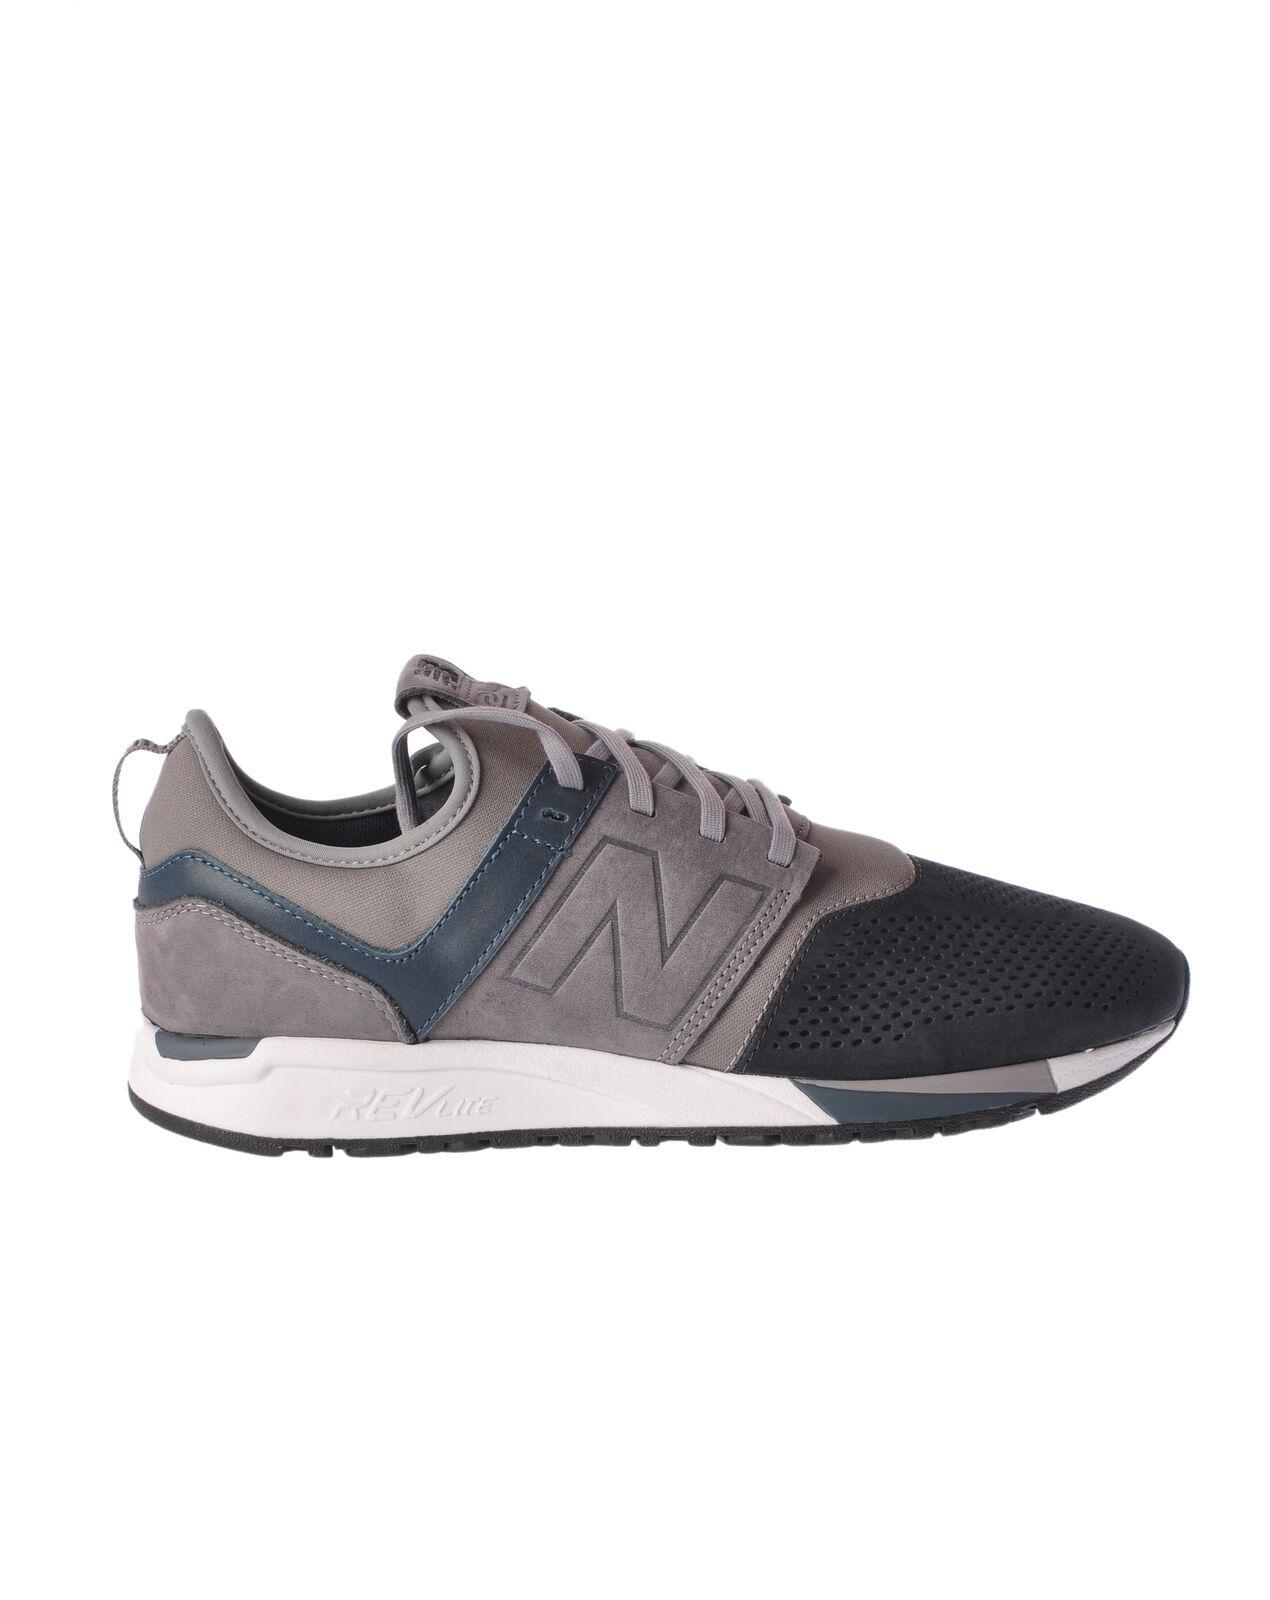 New Balance - shoes-shoes - Man - Grey - 4748910H185041